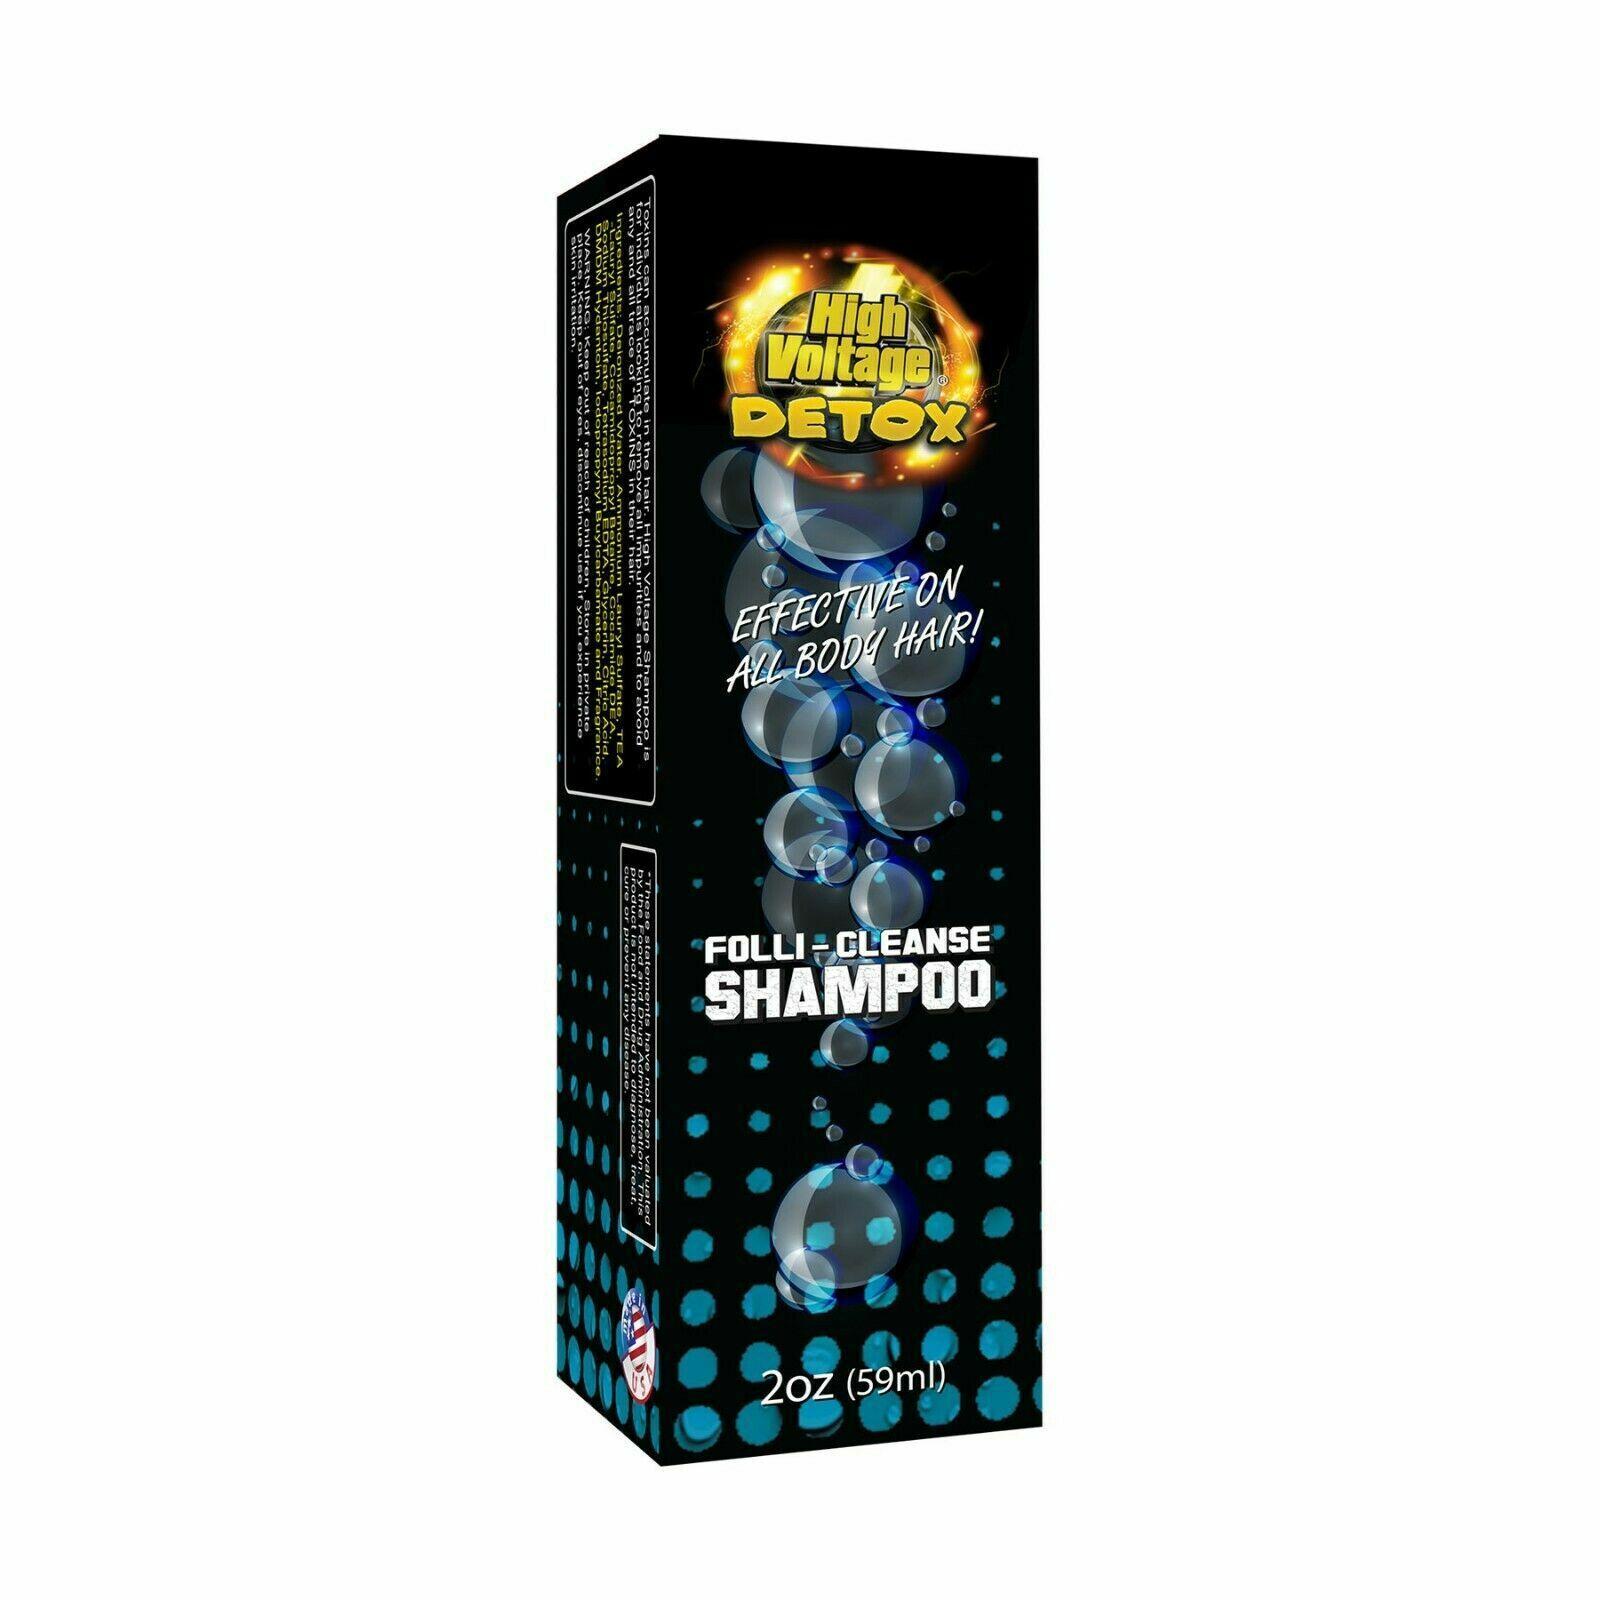 High Voltage Detox Folli-Cleanse Shampoo 2oz Cleanse & Detoxify All Body Hair